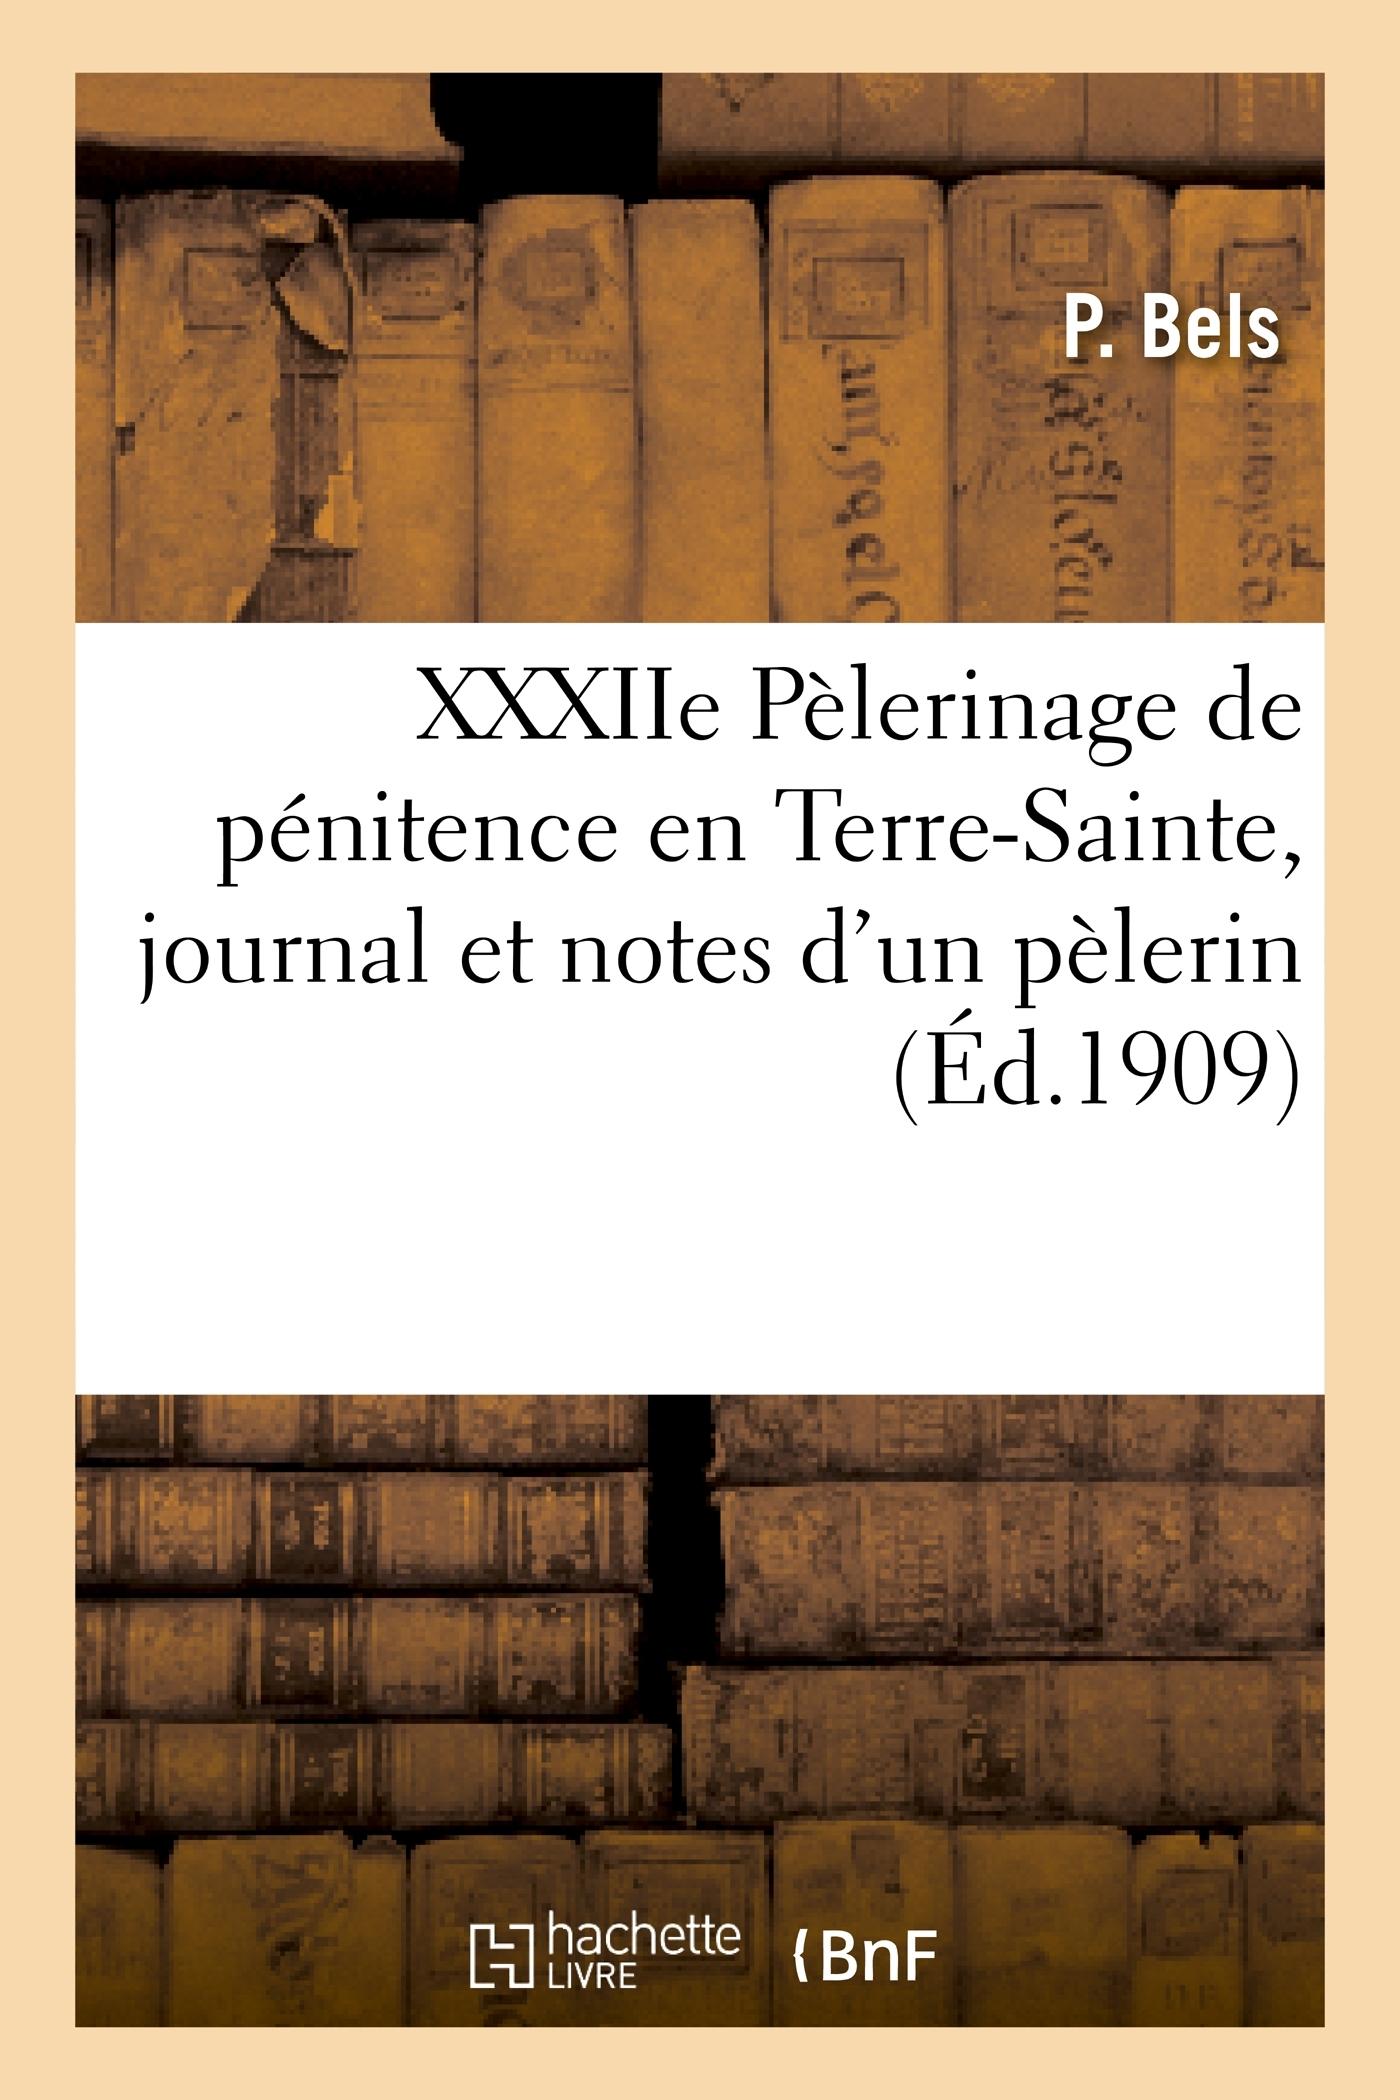 XXXIIE PELERINAGE DE PENITENCE EN TERRE-SAINTE, JOURNAL ET NOTES D'UN PELERIN